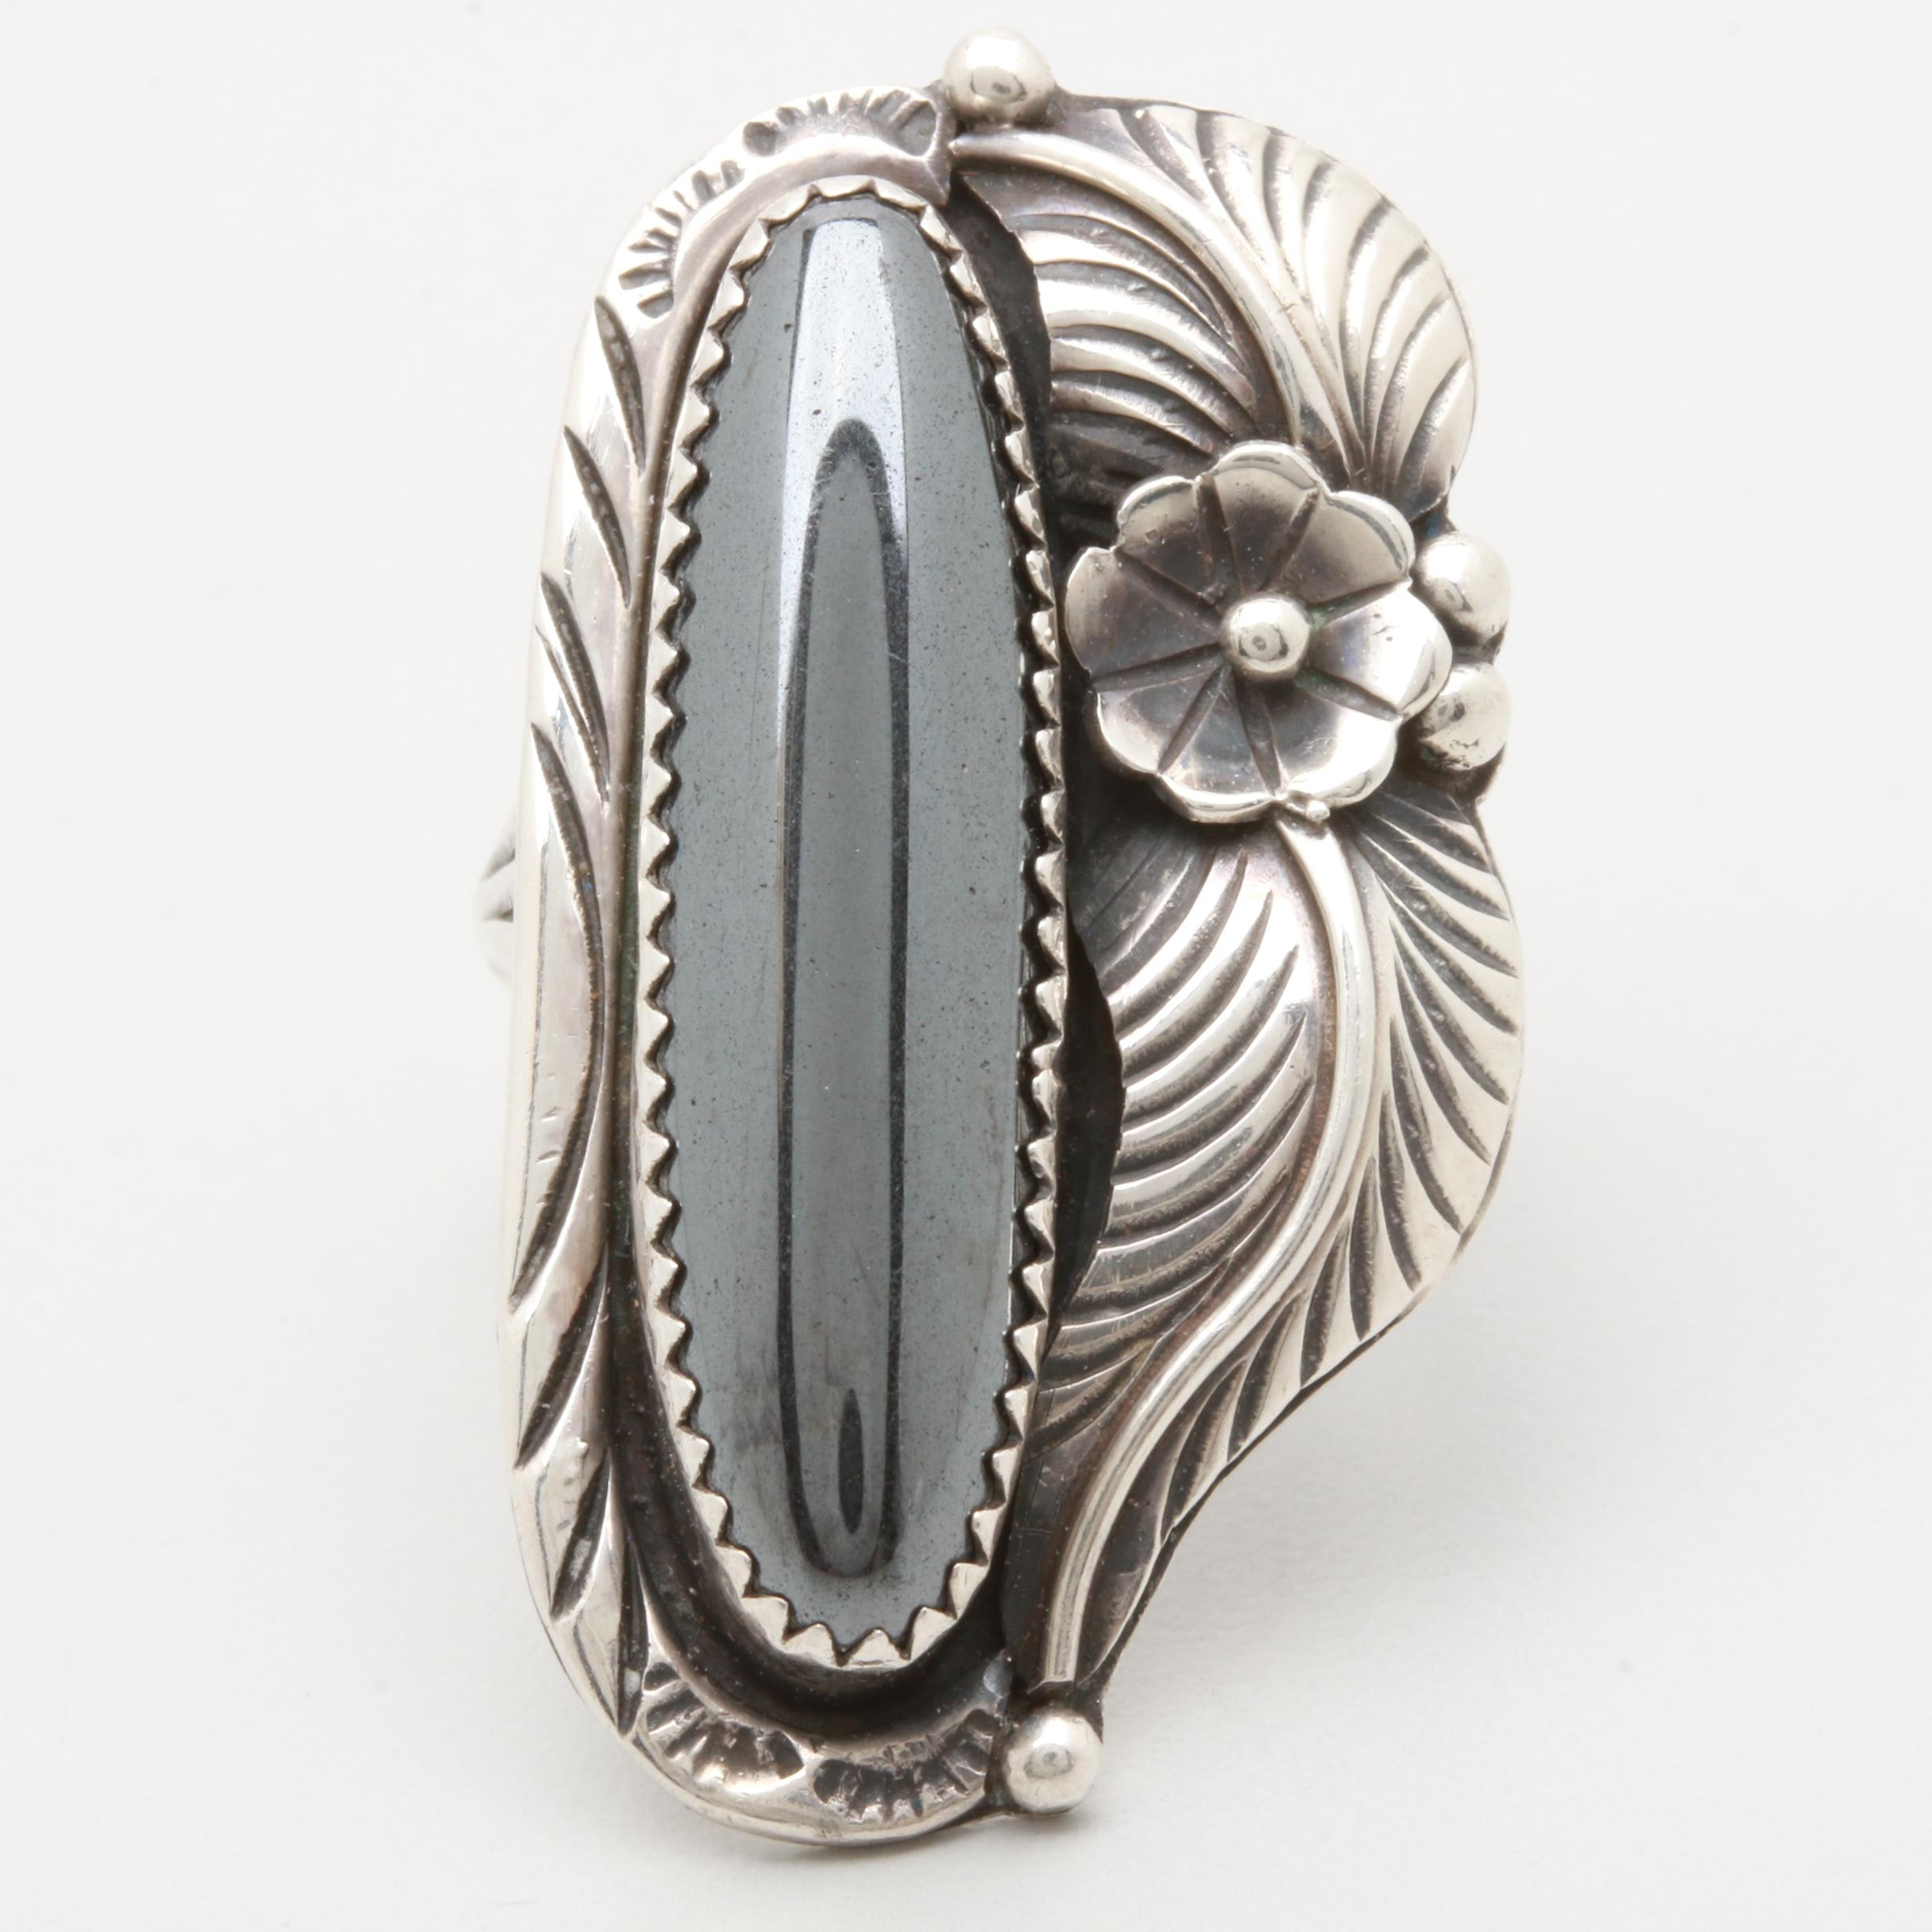 L. Charley Navajo Diné Sterling Silver Hematite Ring